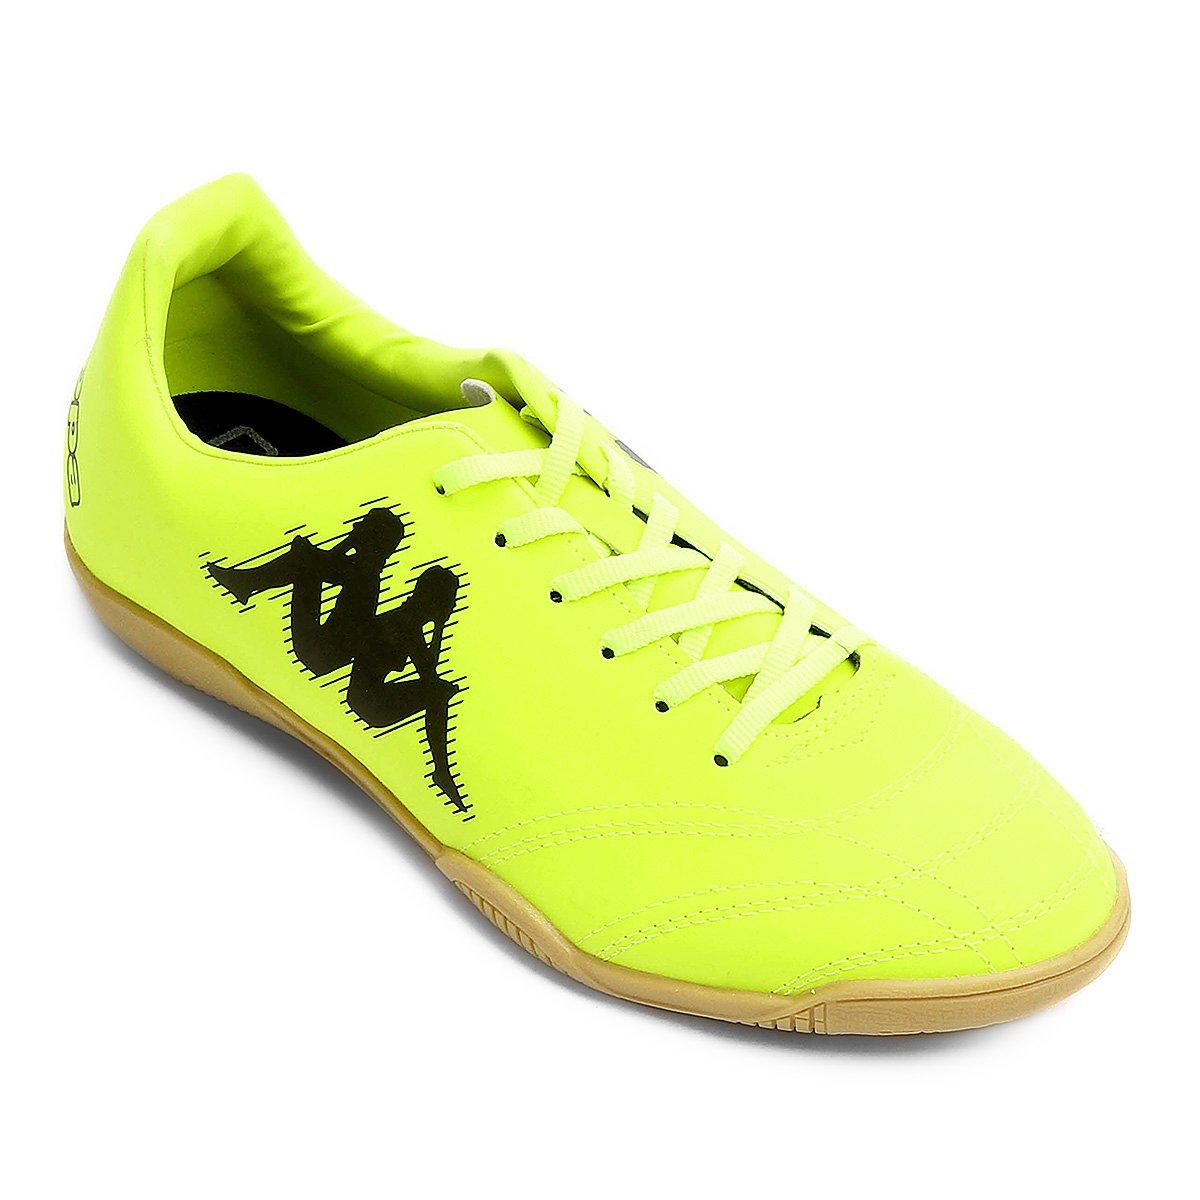 3c89422aabd51 Chuteira Futsal Kappa Piave - Compre Agora